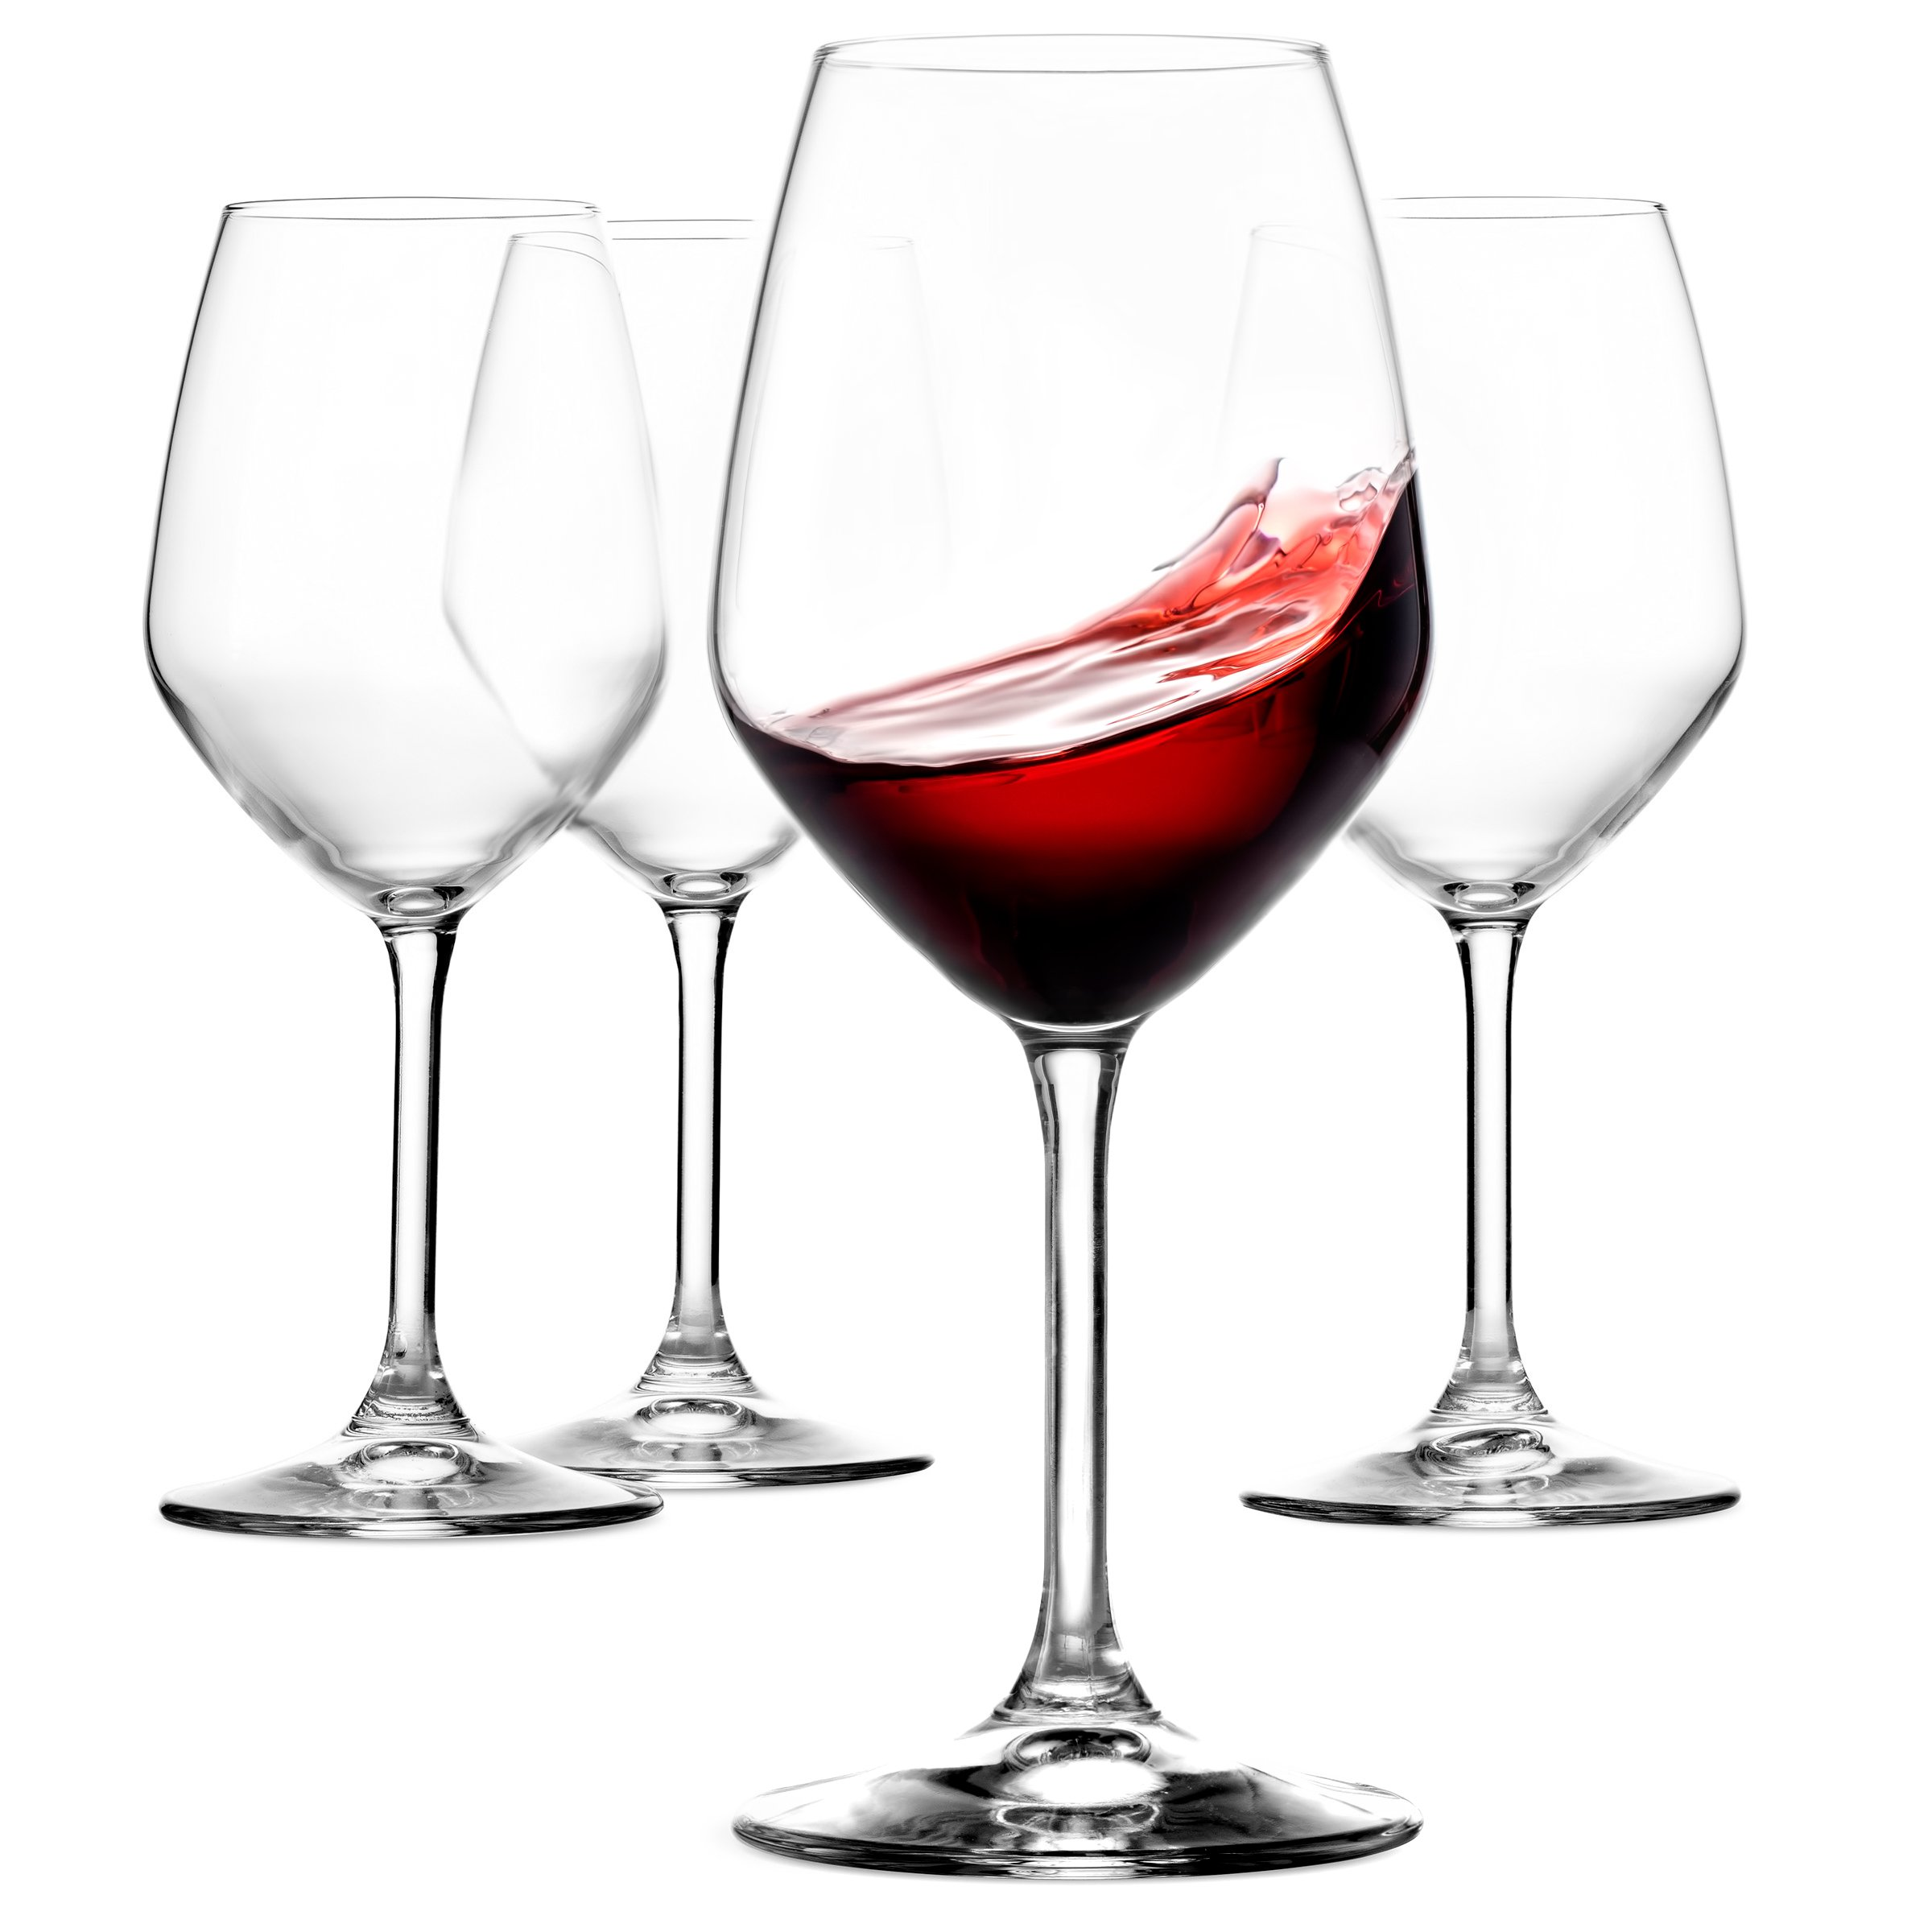 Paksh Novelty Italian Red Wine Glasses - 18 Ounce - Lead Free - Wine Glass Set of 4, Clear by Paksh Novelty